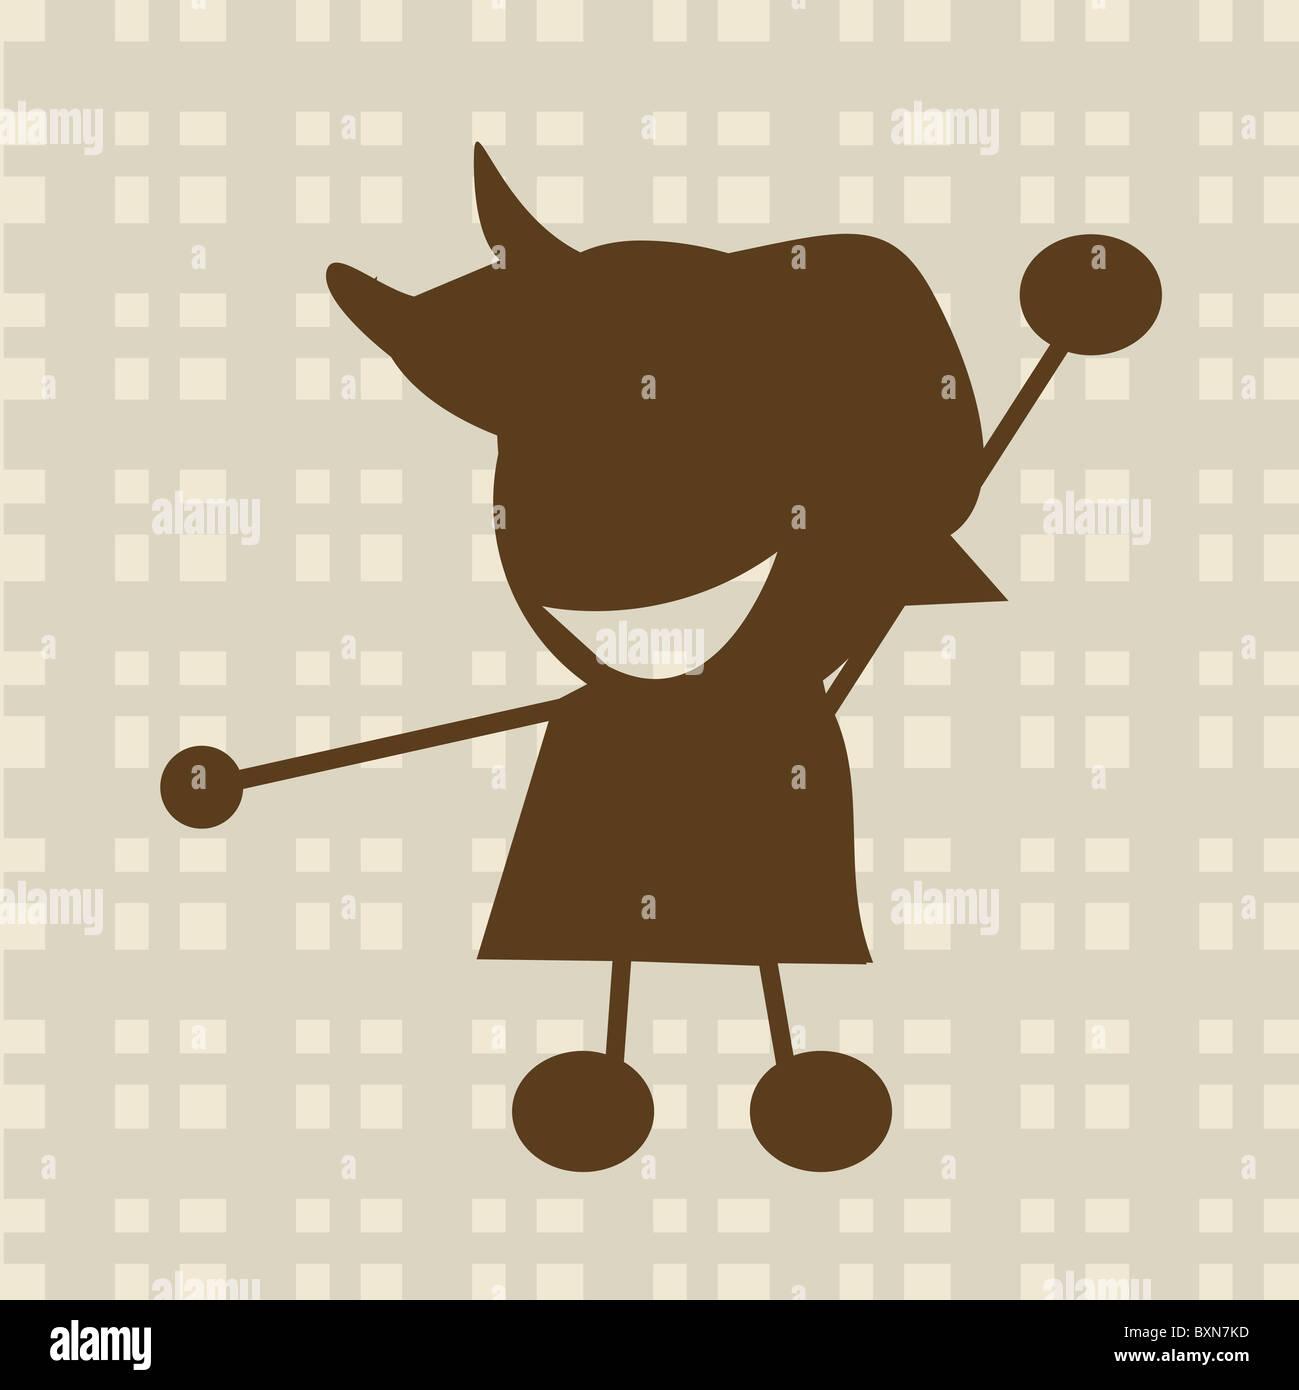 Little boy illustration - Stock Image